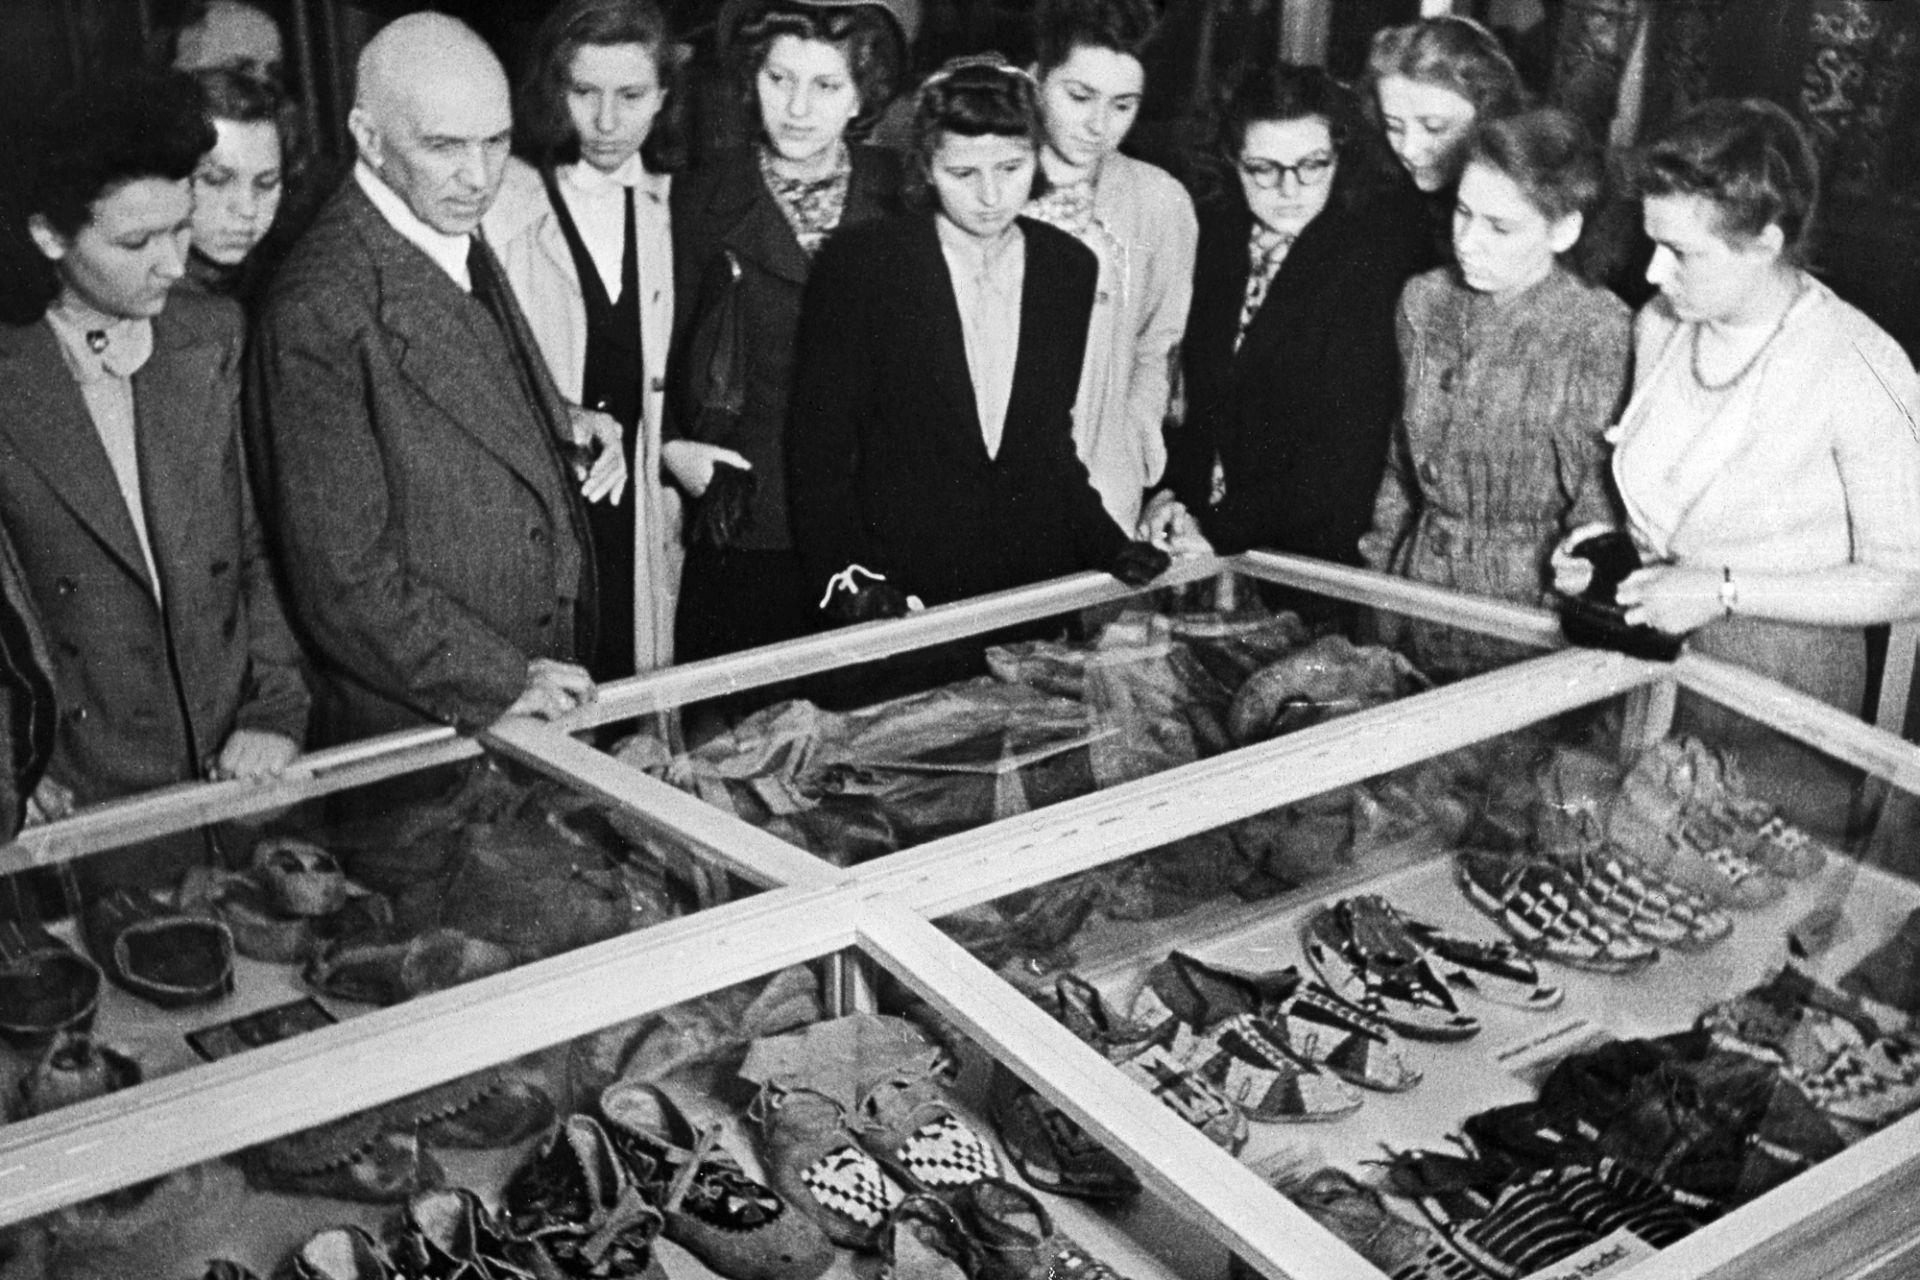 Museumsführung mit Hugo Eberhardt, um 1942